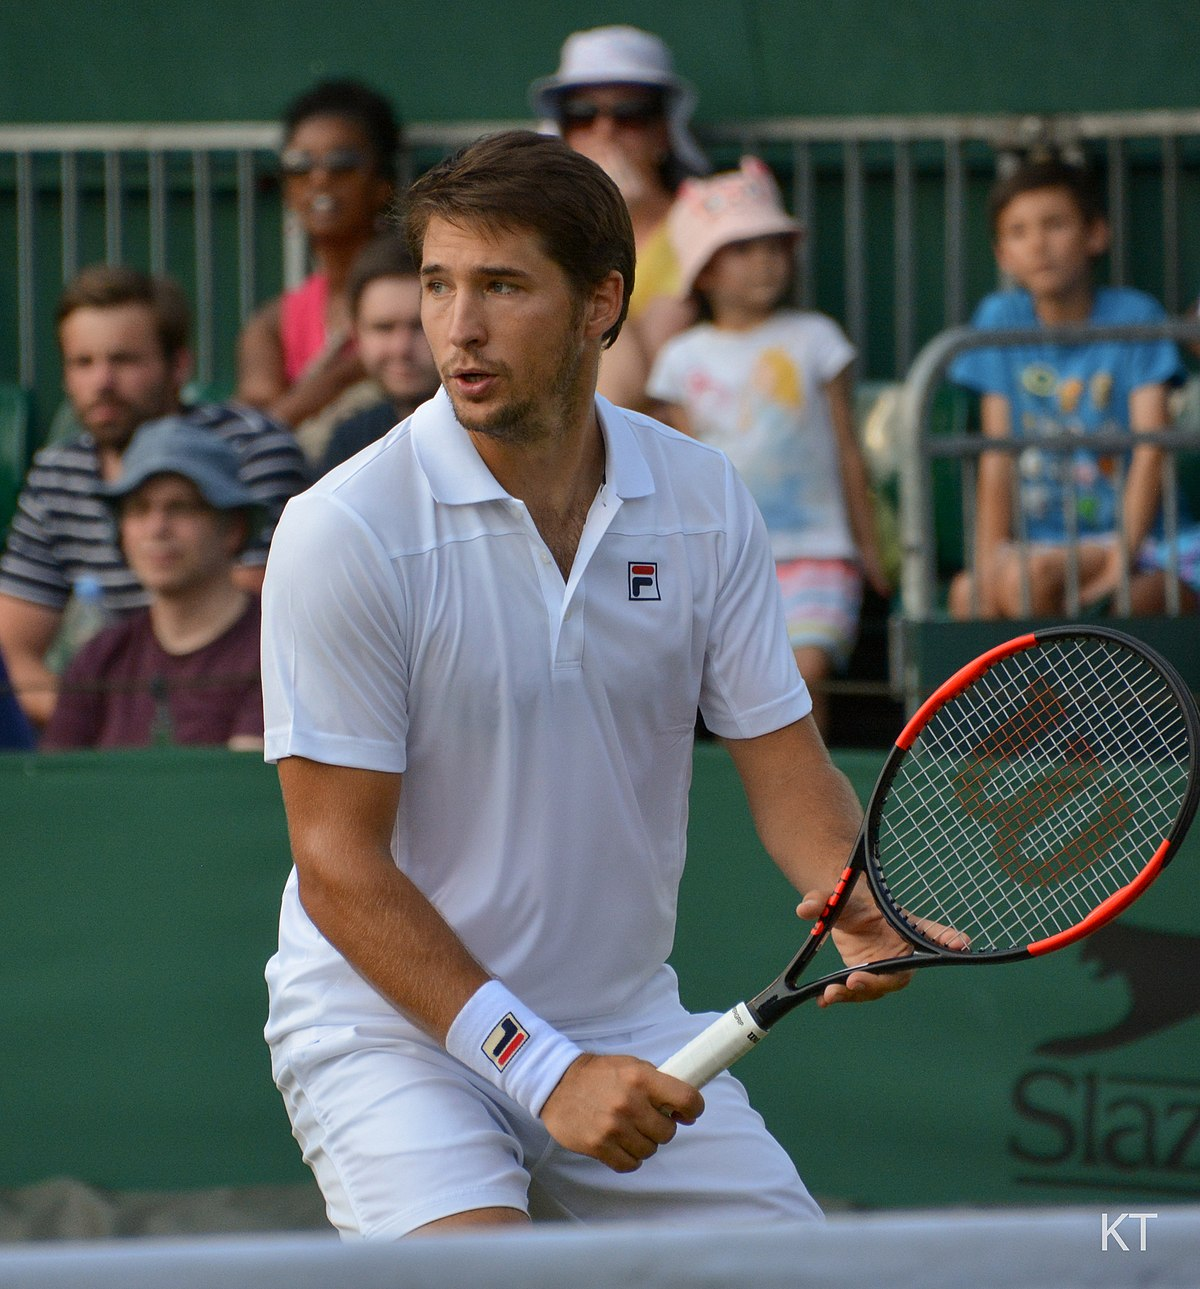 image de raquette de tennis